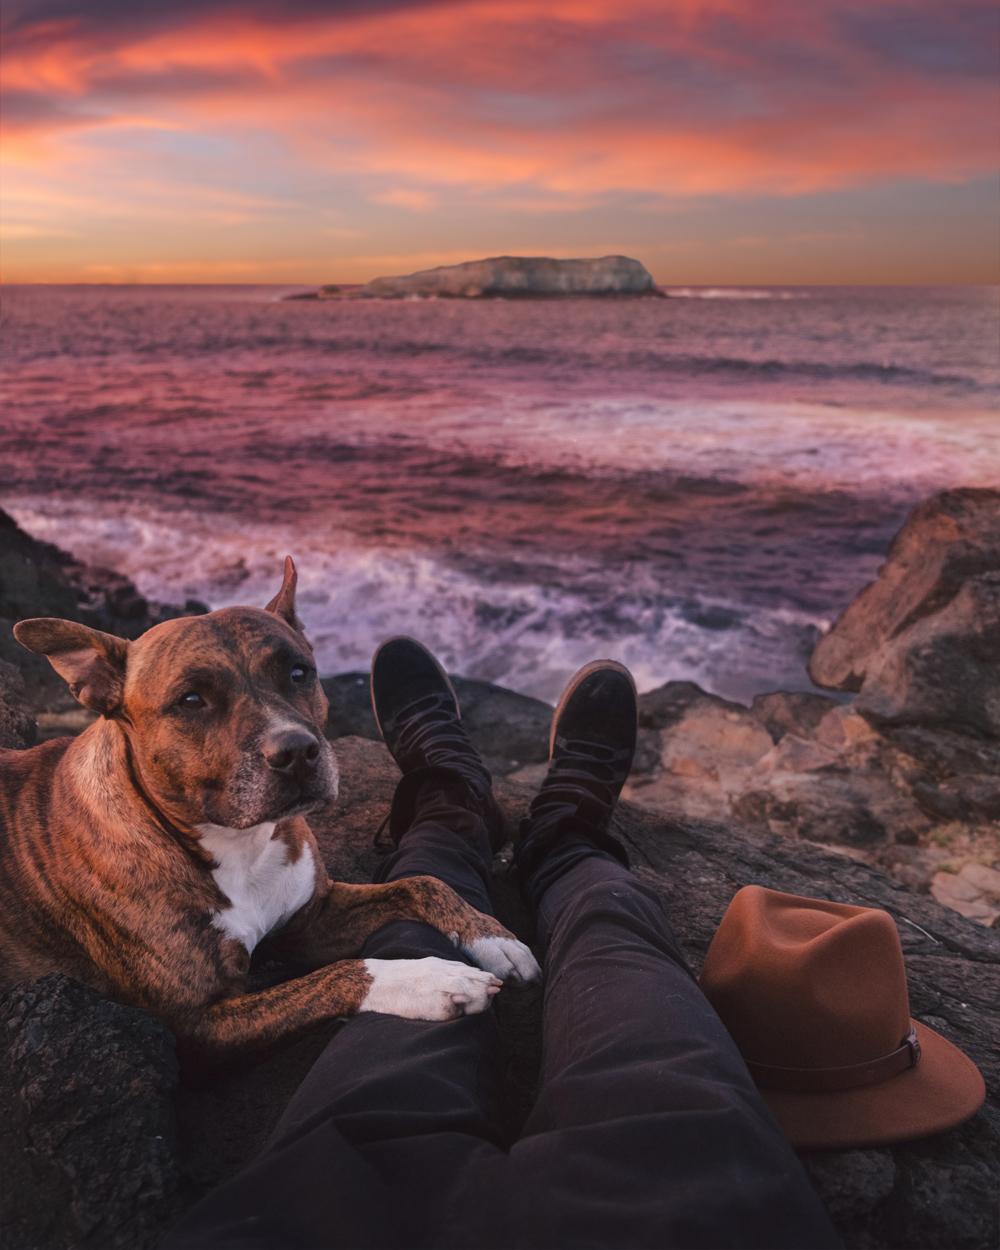 leio-mclaren-299158 How to Take Expressive Photos of Pets Photography Tips